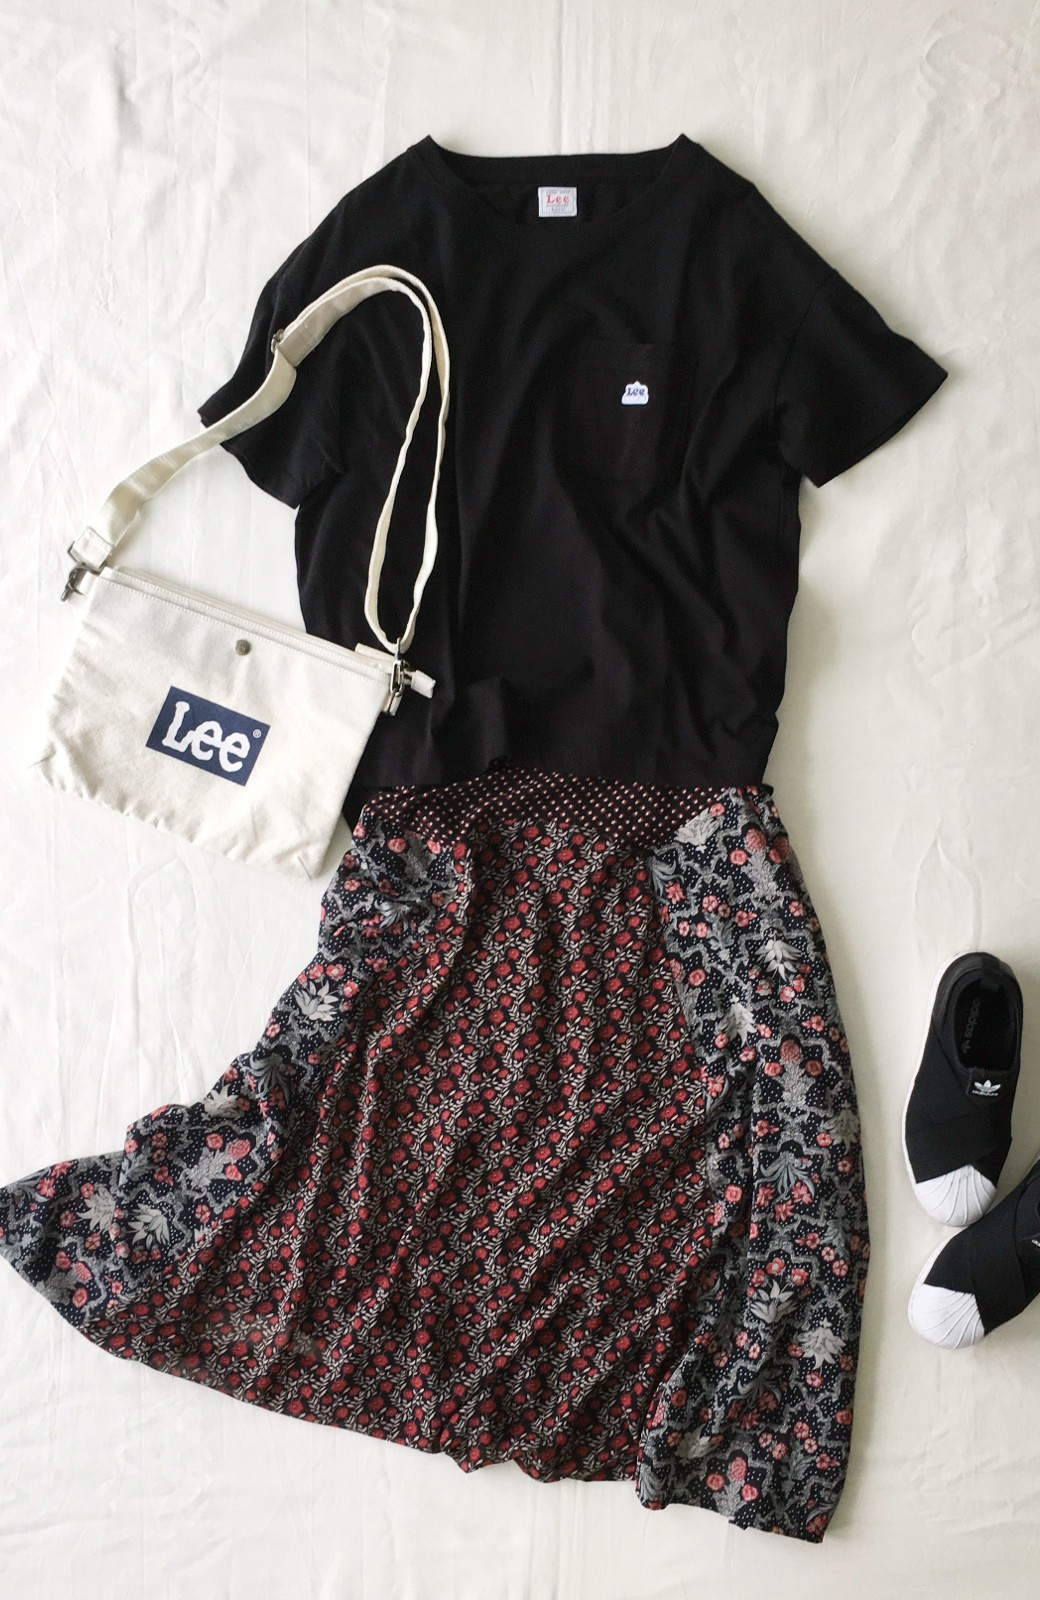 haco! 【洗濯機洗いOK】シンプルなトップスに合わせるだけでかわいくなれる MIX柄スカート <ブラック系その他>の商品写真15